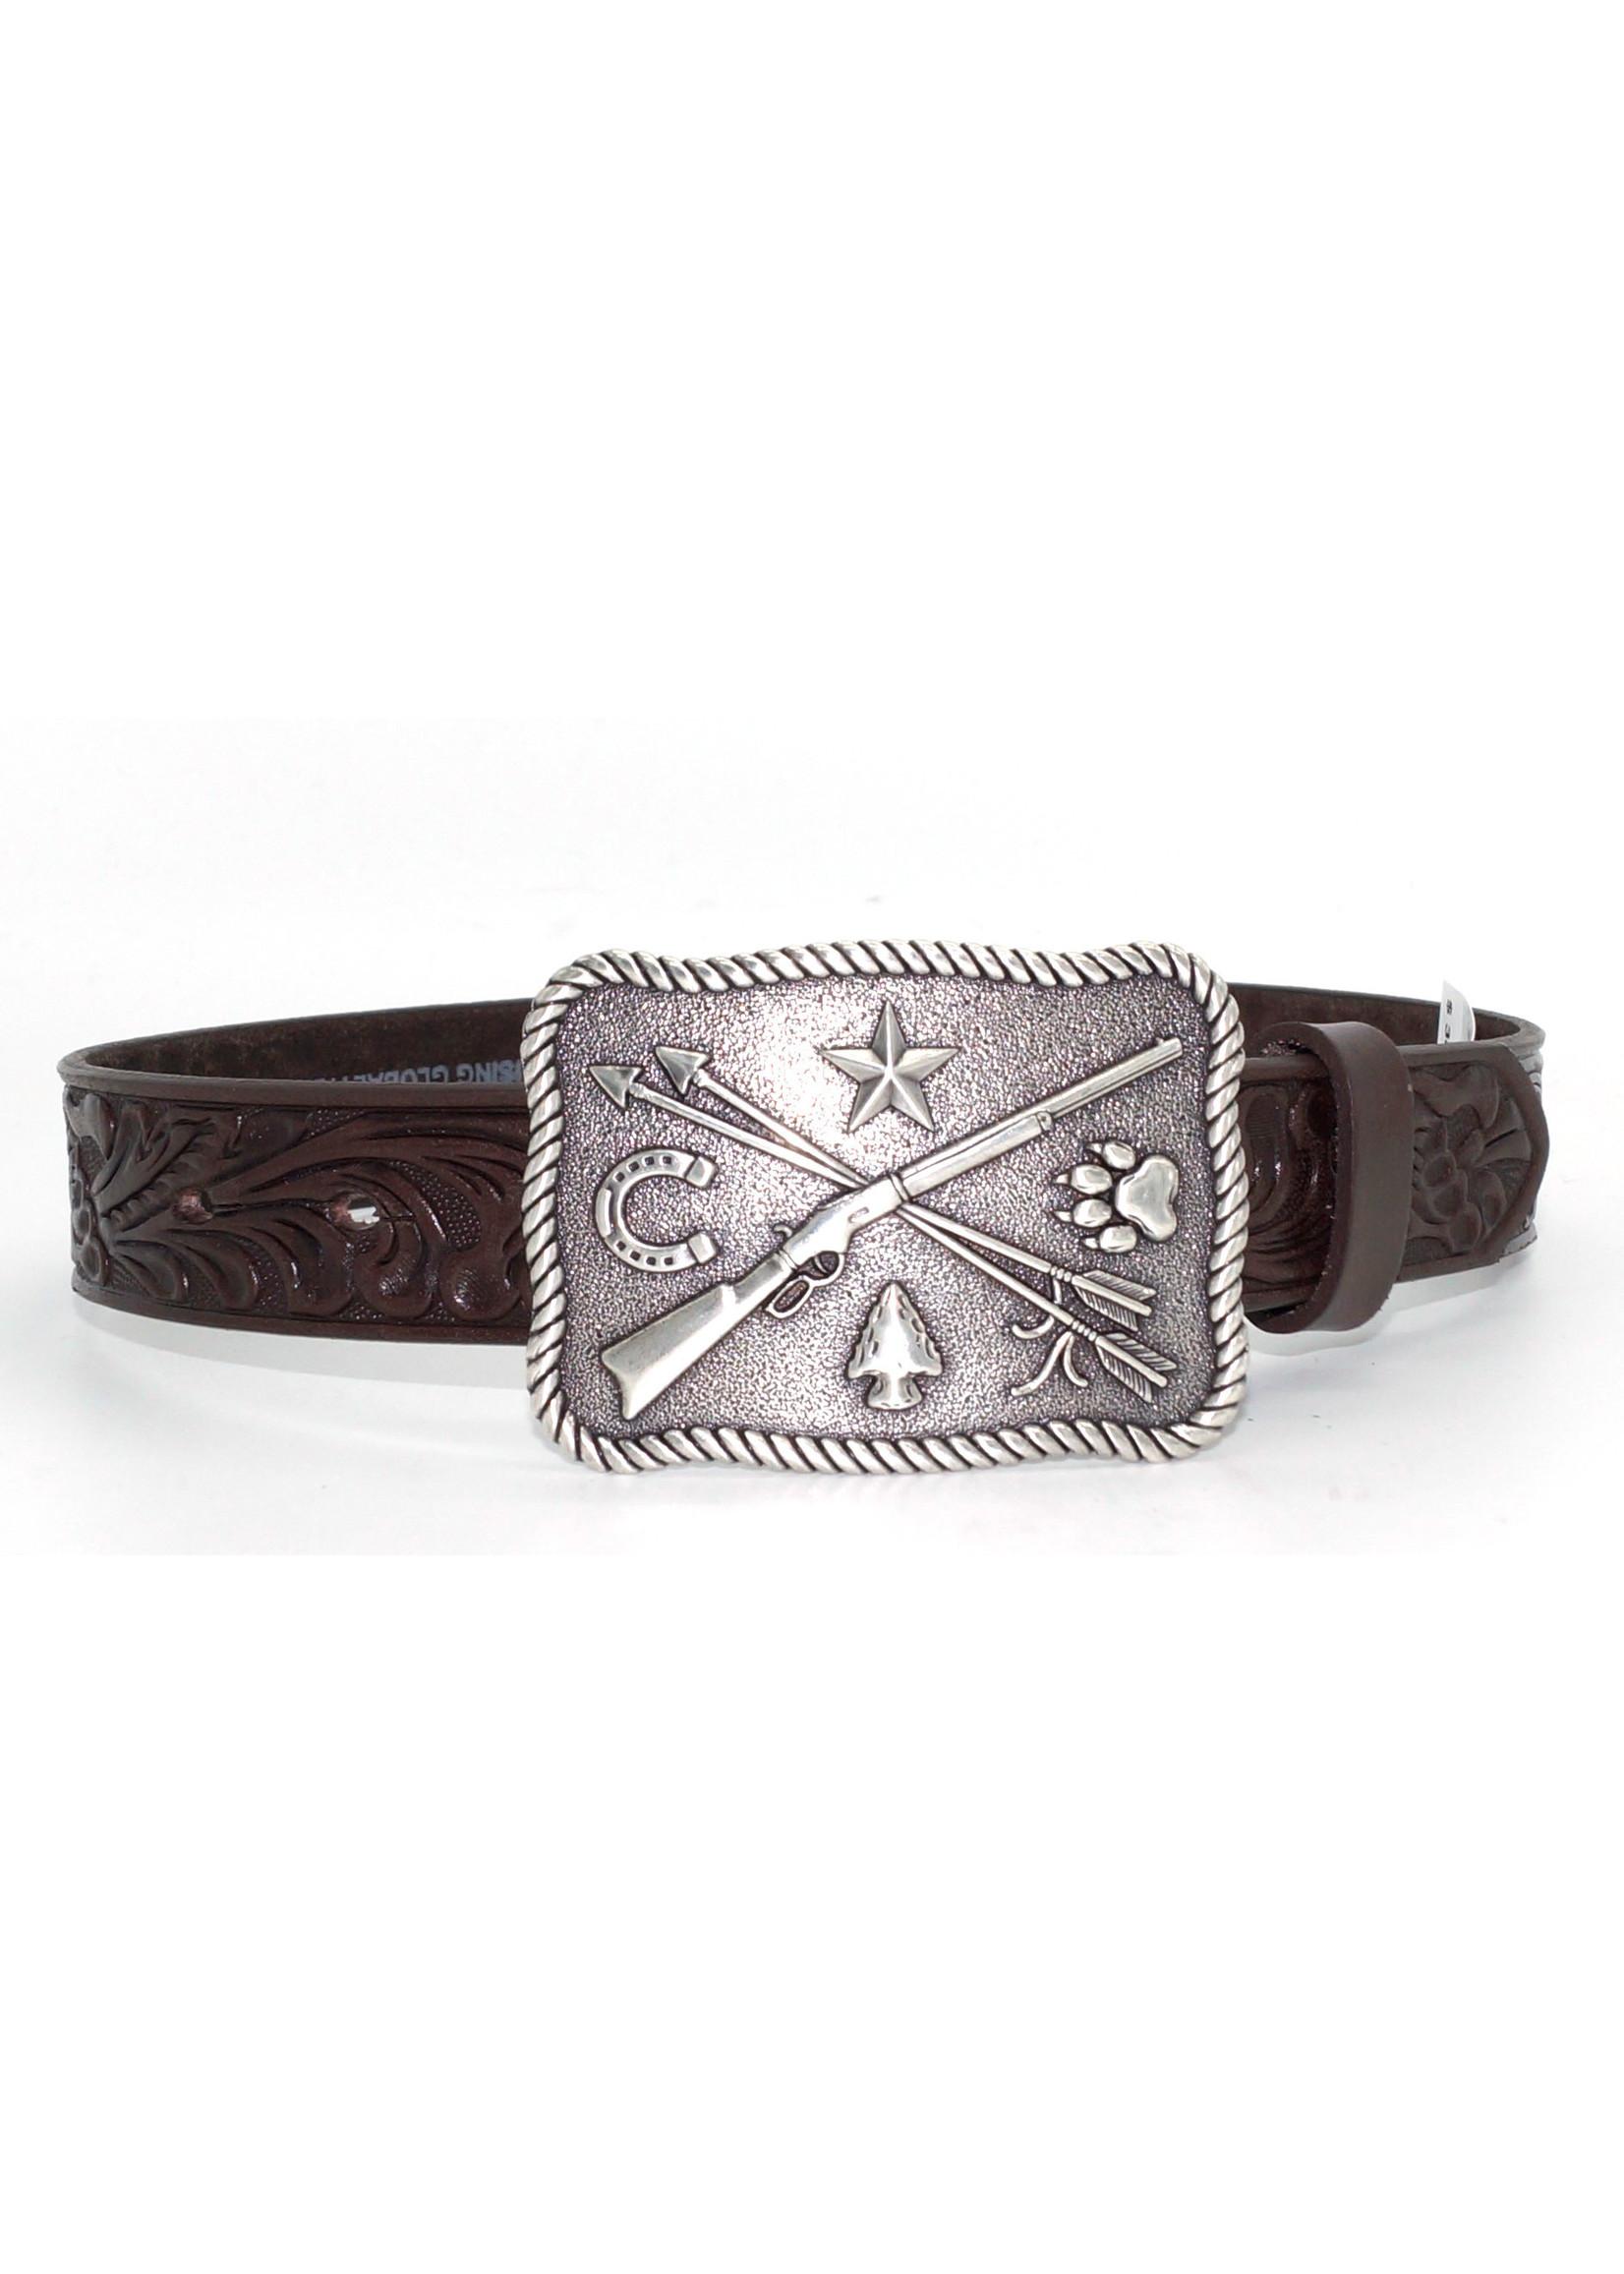 Tony Lama Children's Cowboy & Indian Leather Belt C60238